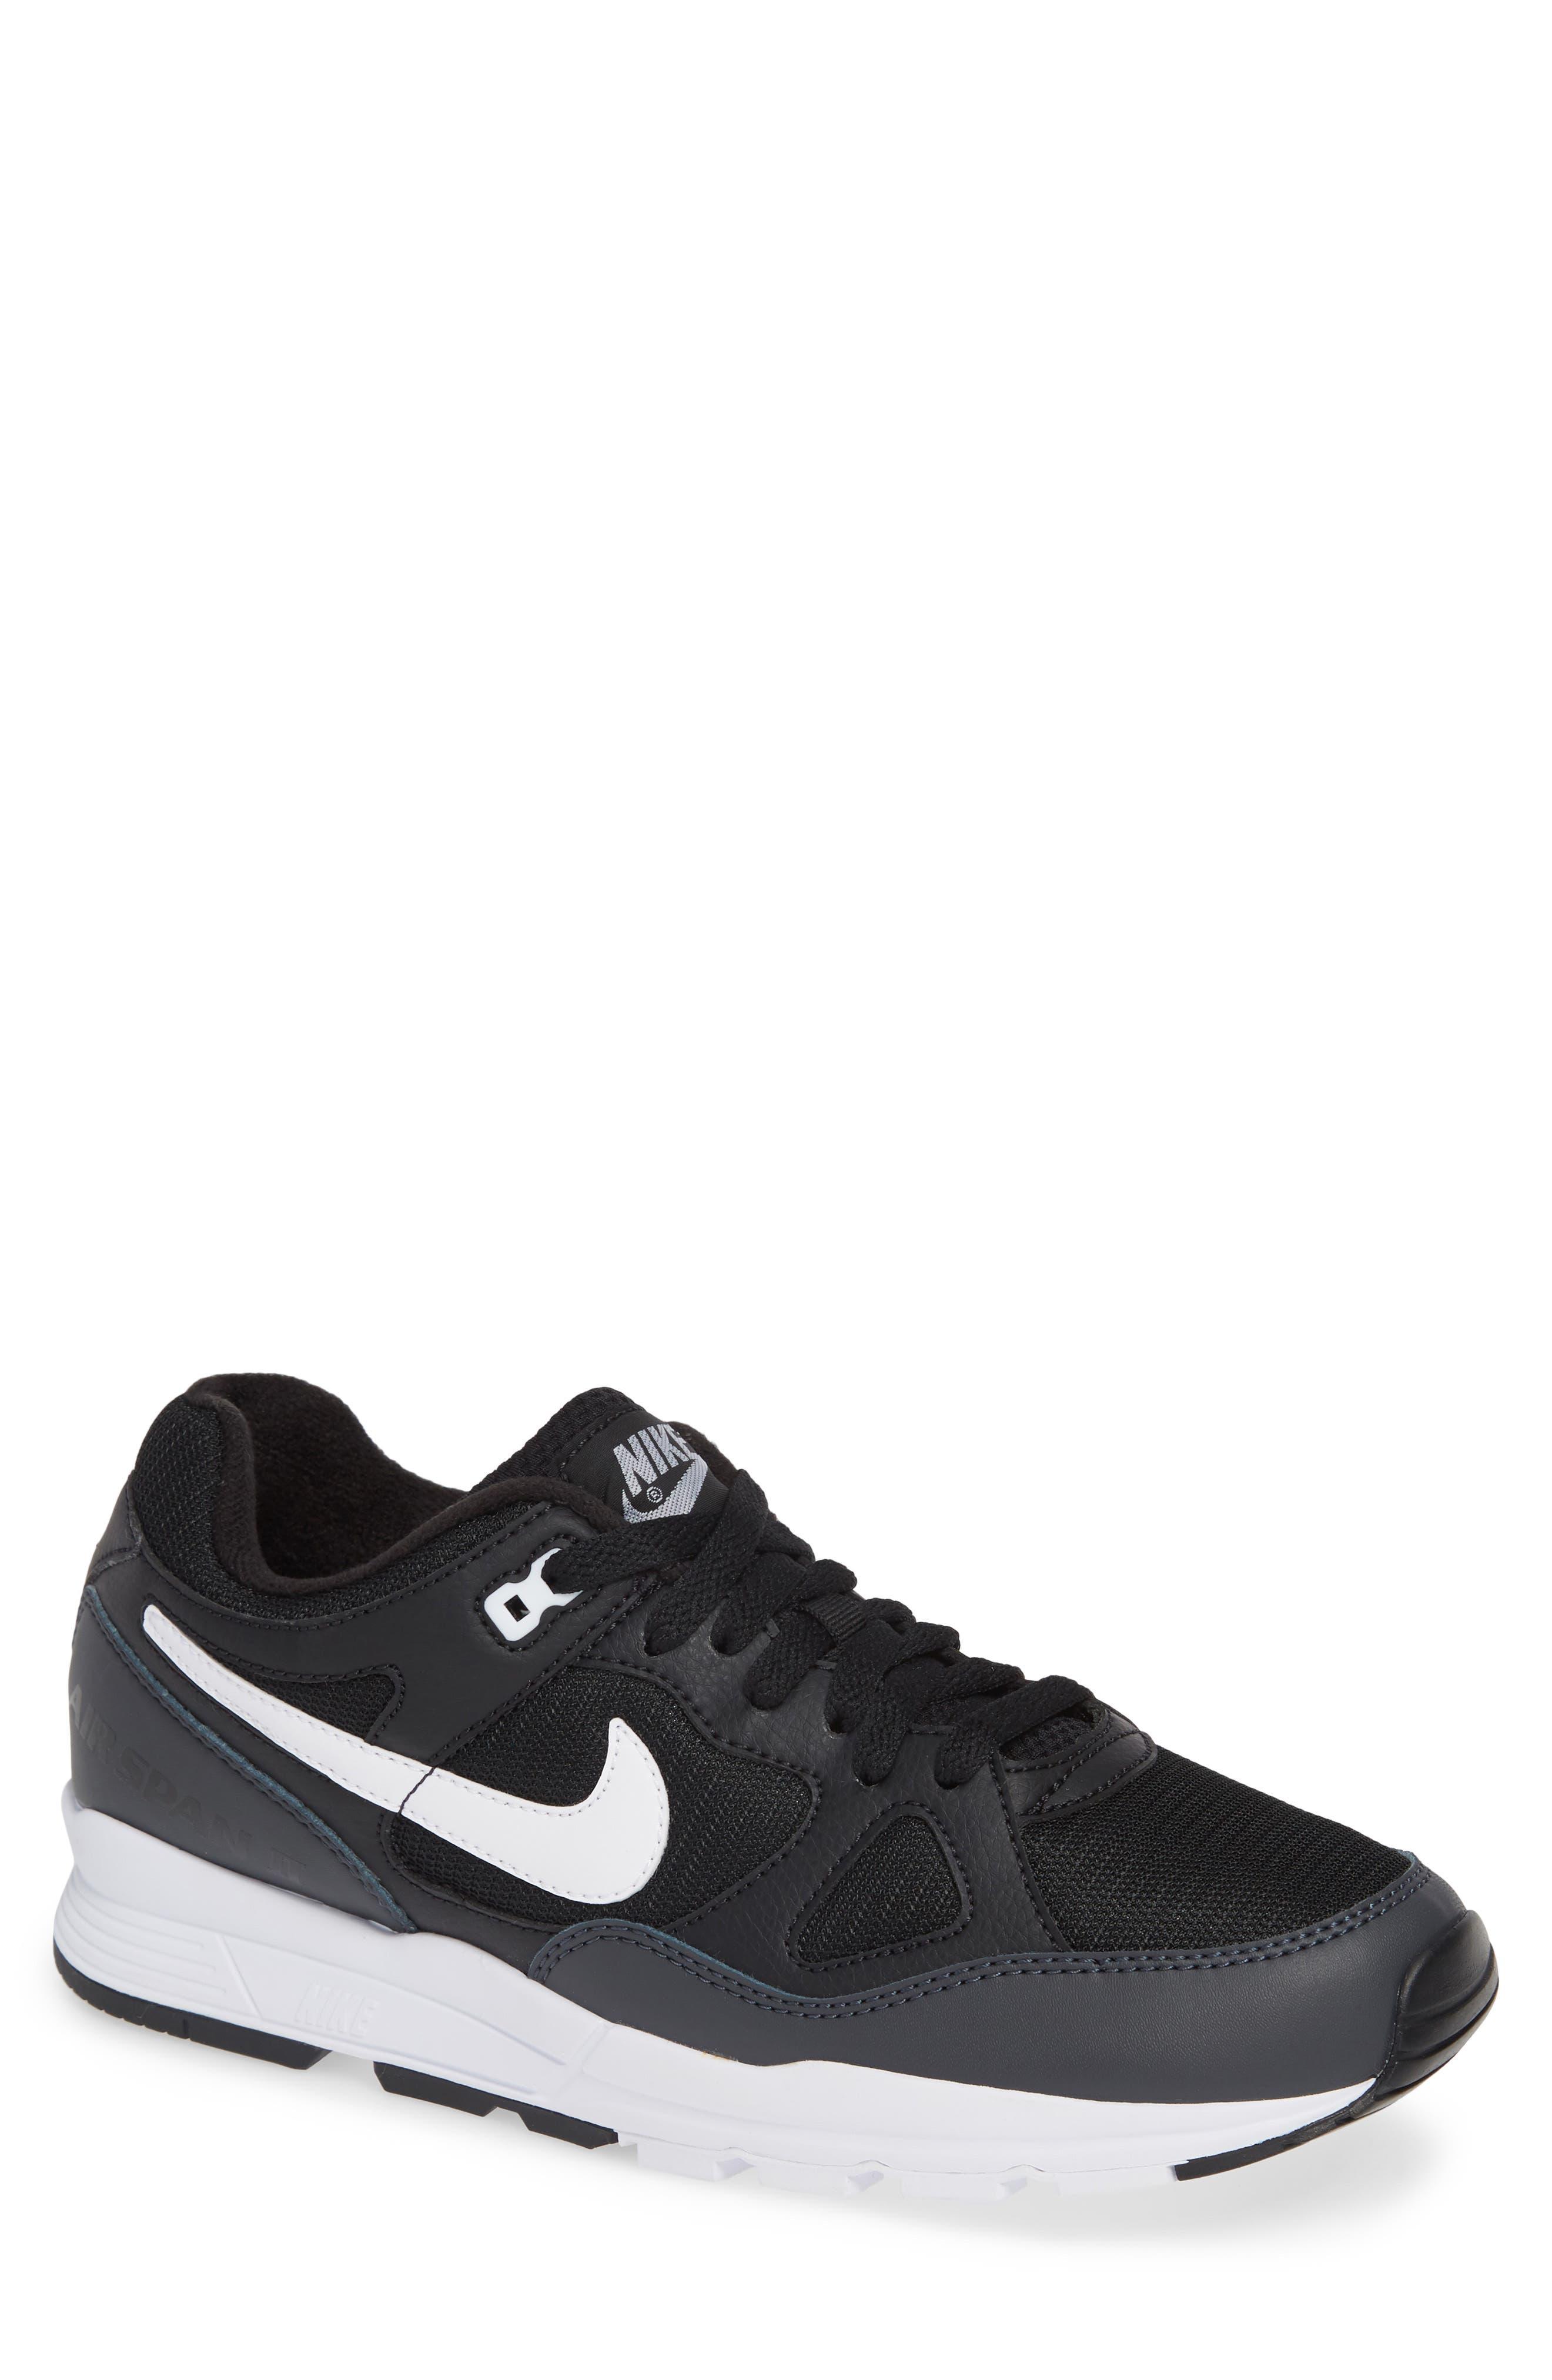 Air Span II Sneaker,                             Main thumbnail 1, color,                             BLACK/ WHITE/ ANTHRACITE